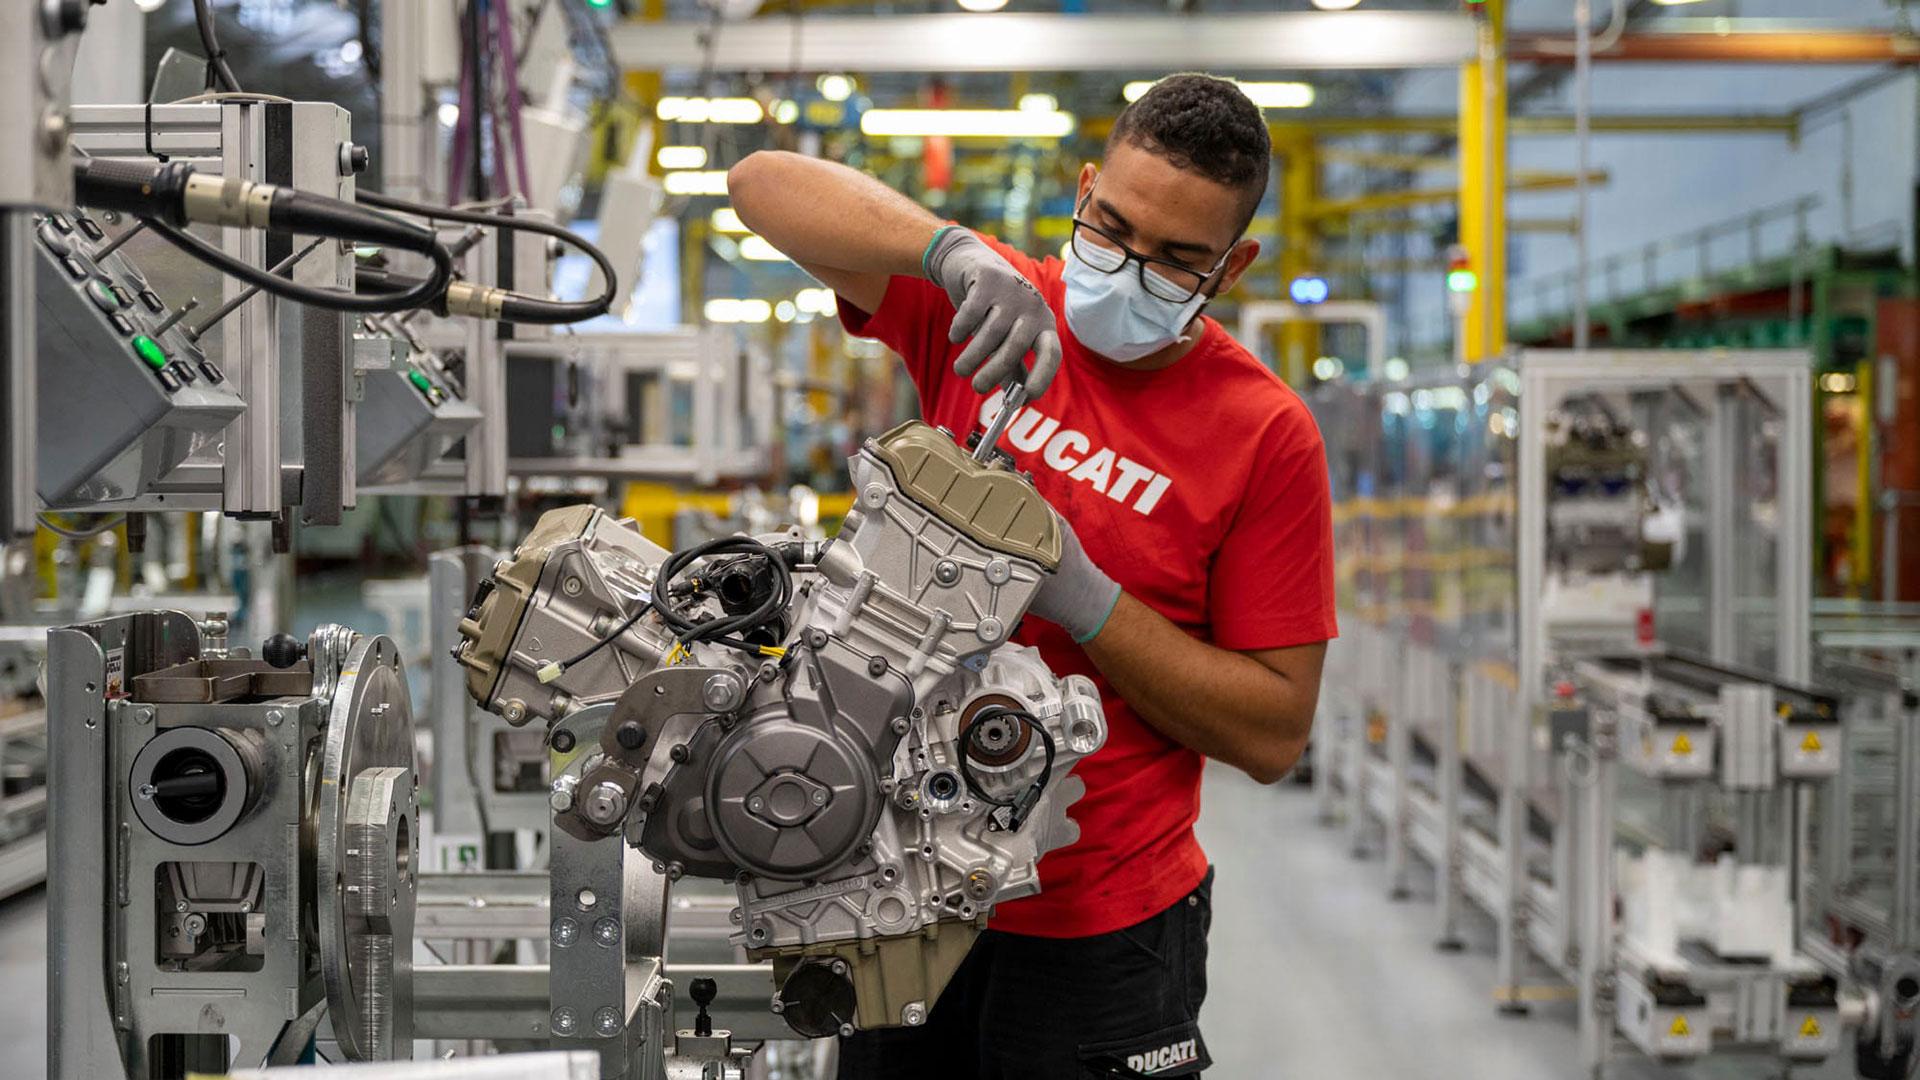 Borgo Panigale Experience: se reanudan las visitas a la fábrica de Ducati